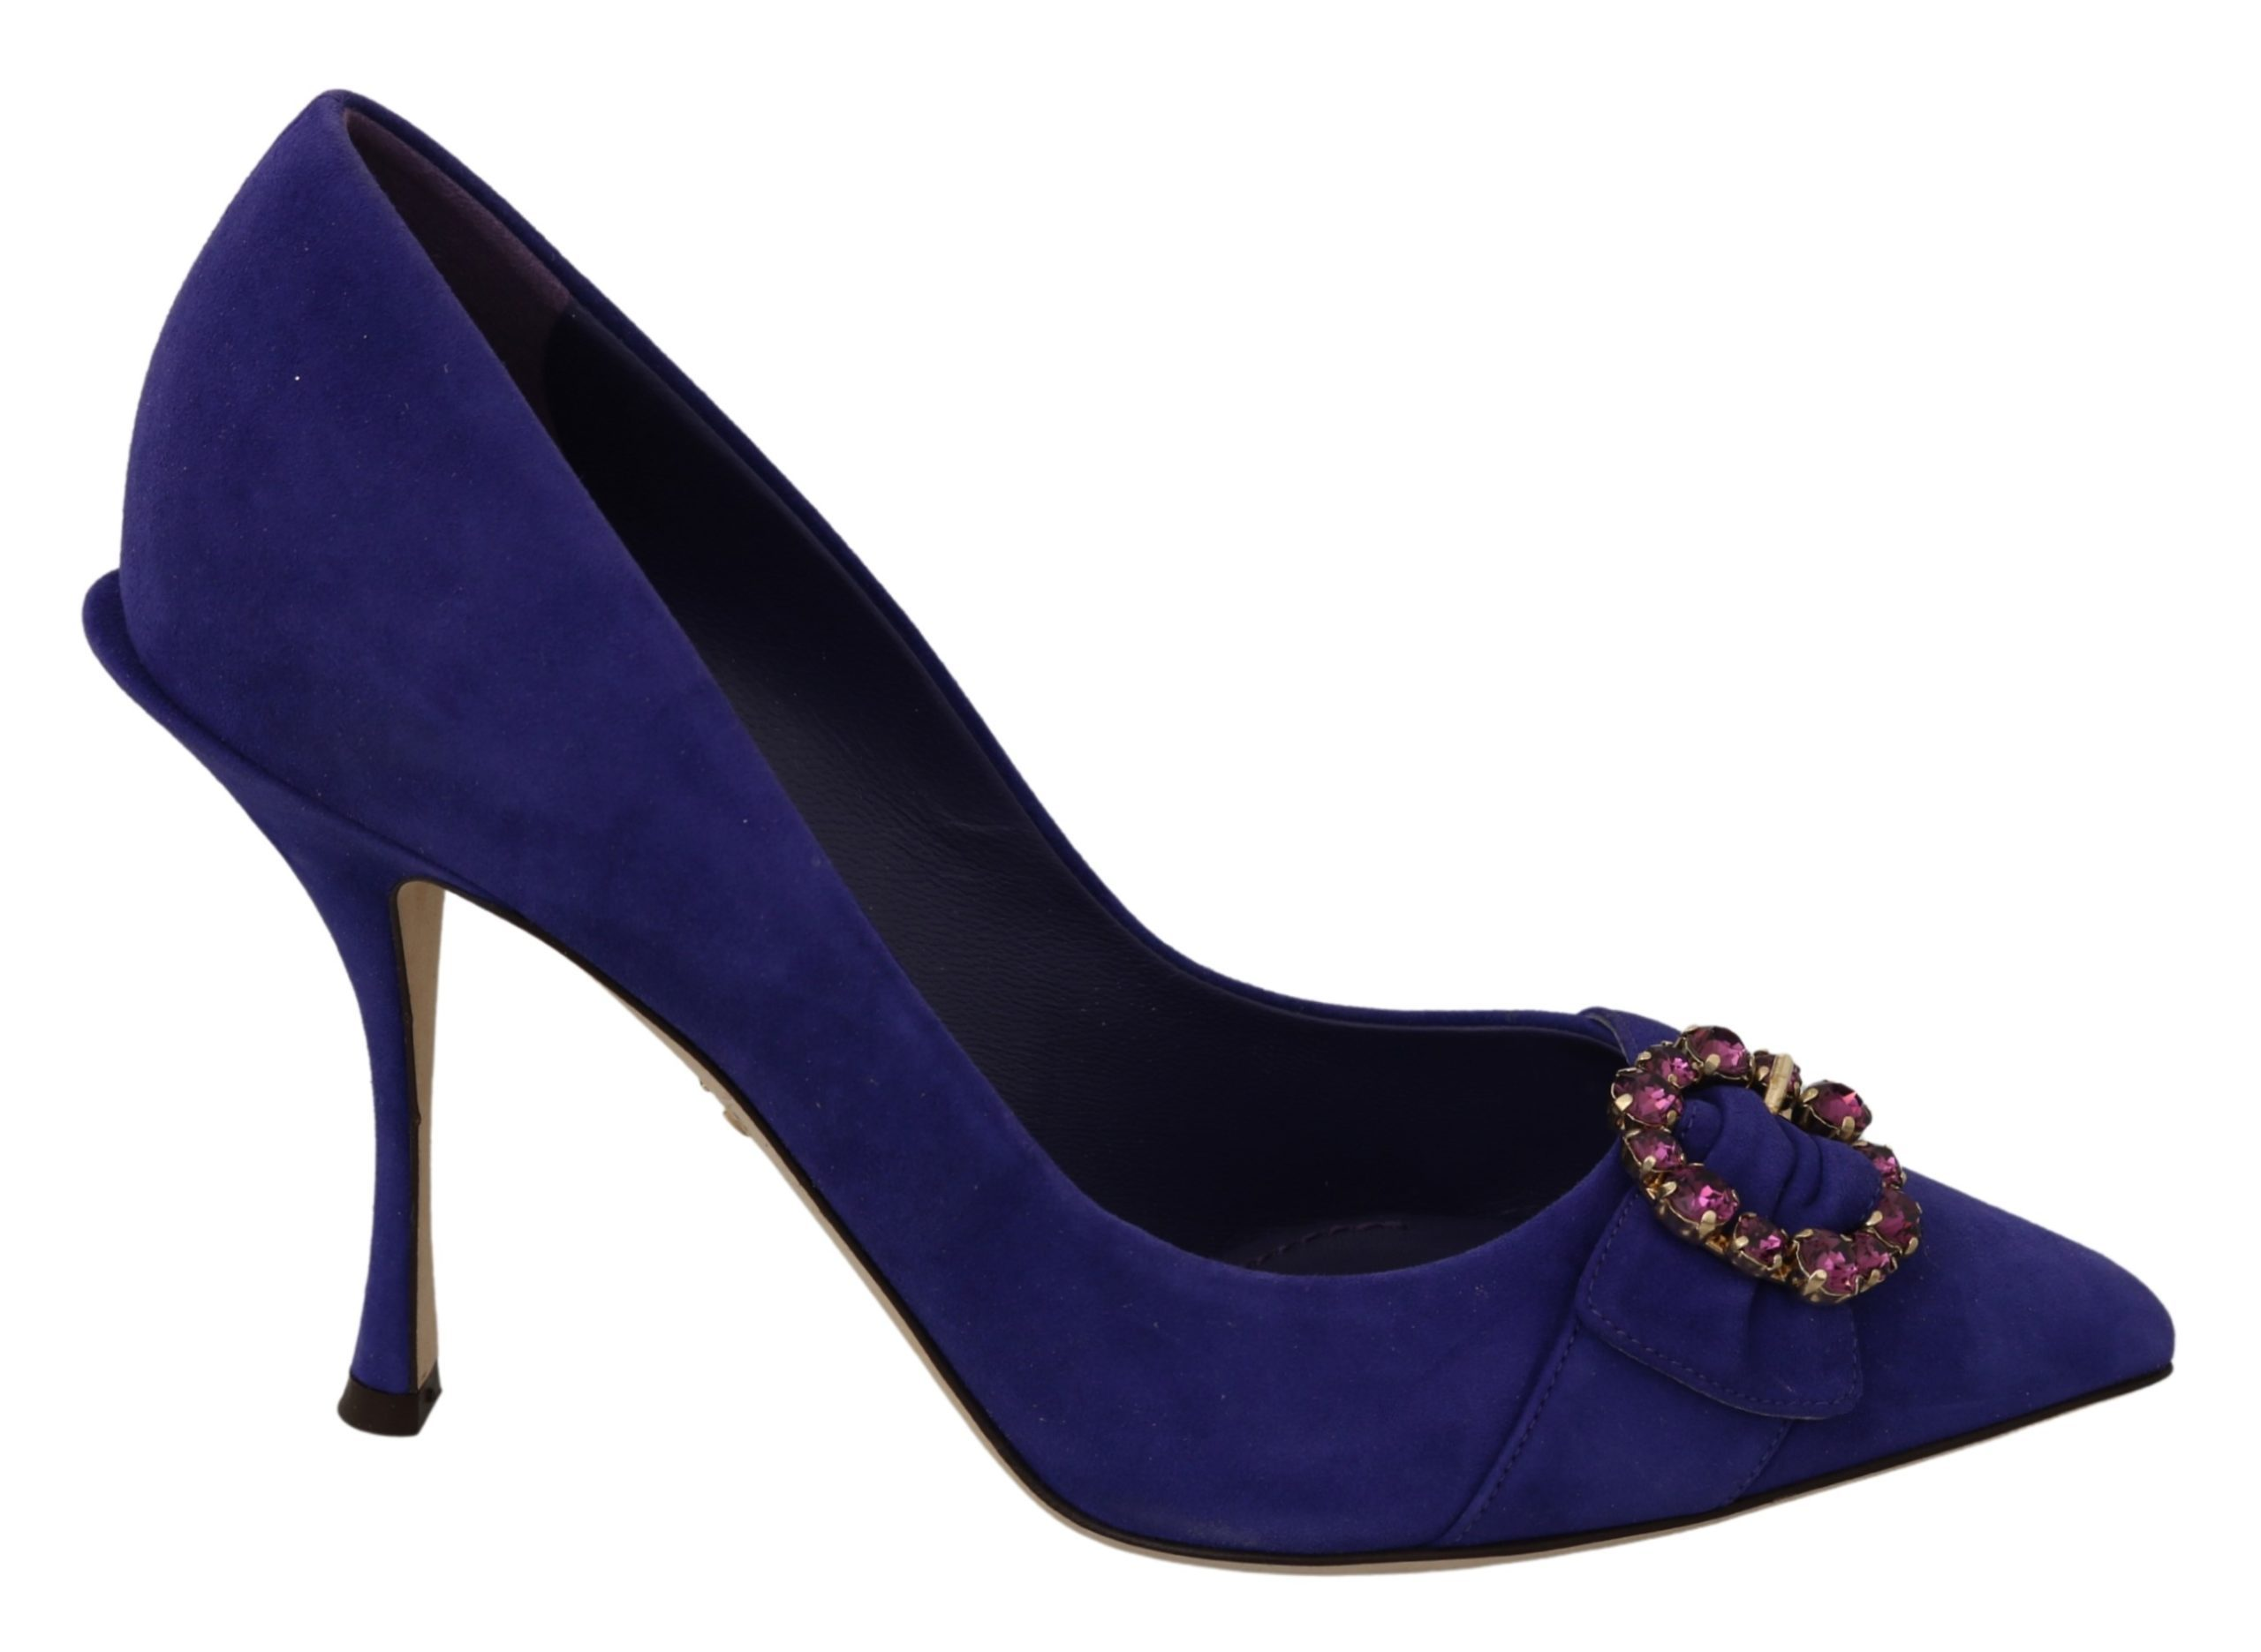 Dolce & Gabbana Women's Suede Crystal High Heel Pumps Purple LA7020 - EU39/US8.5